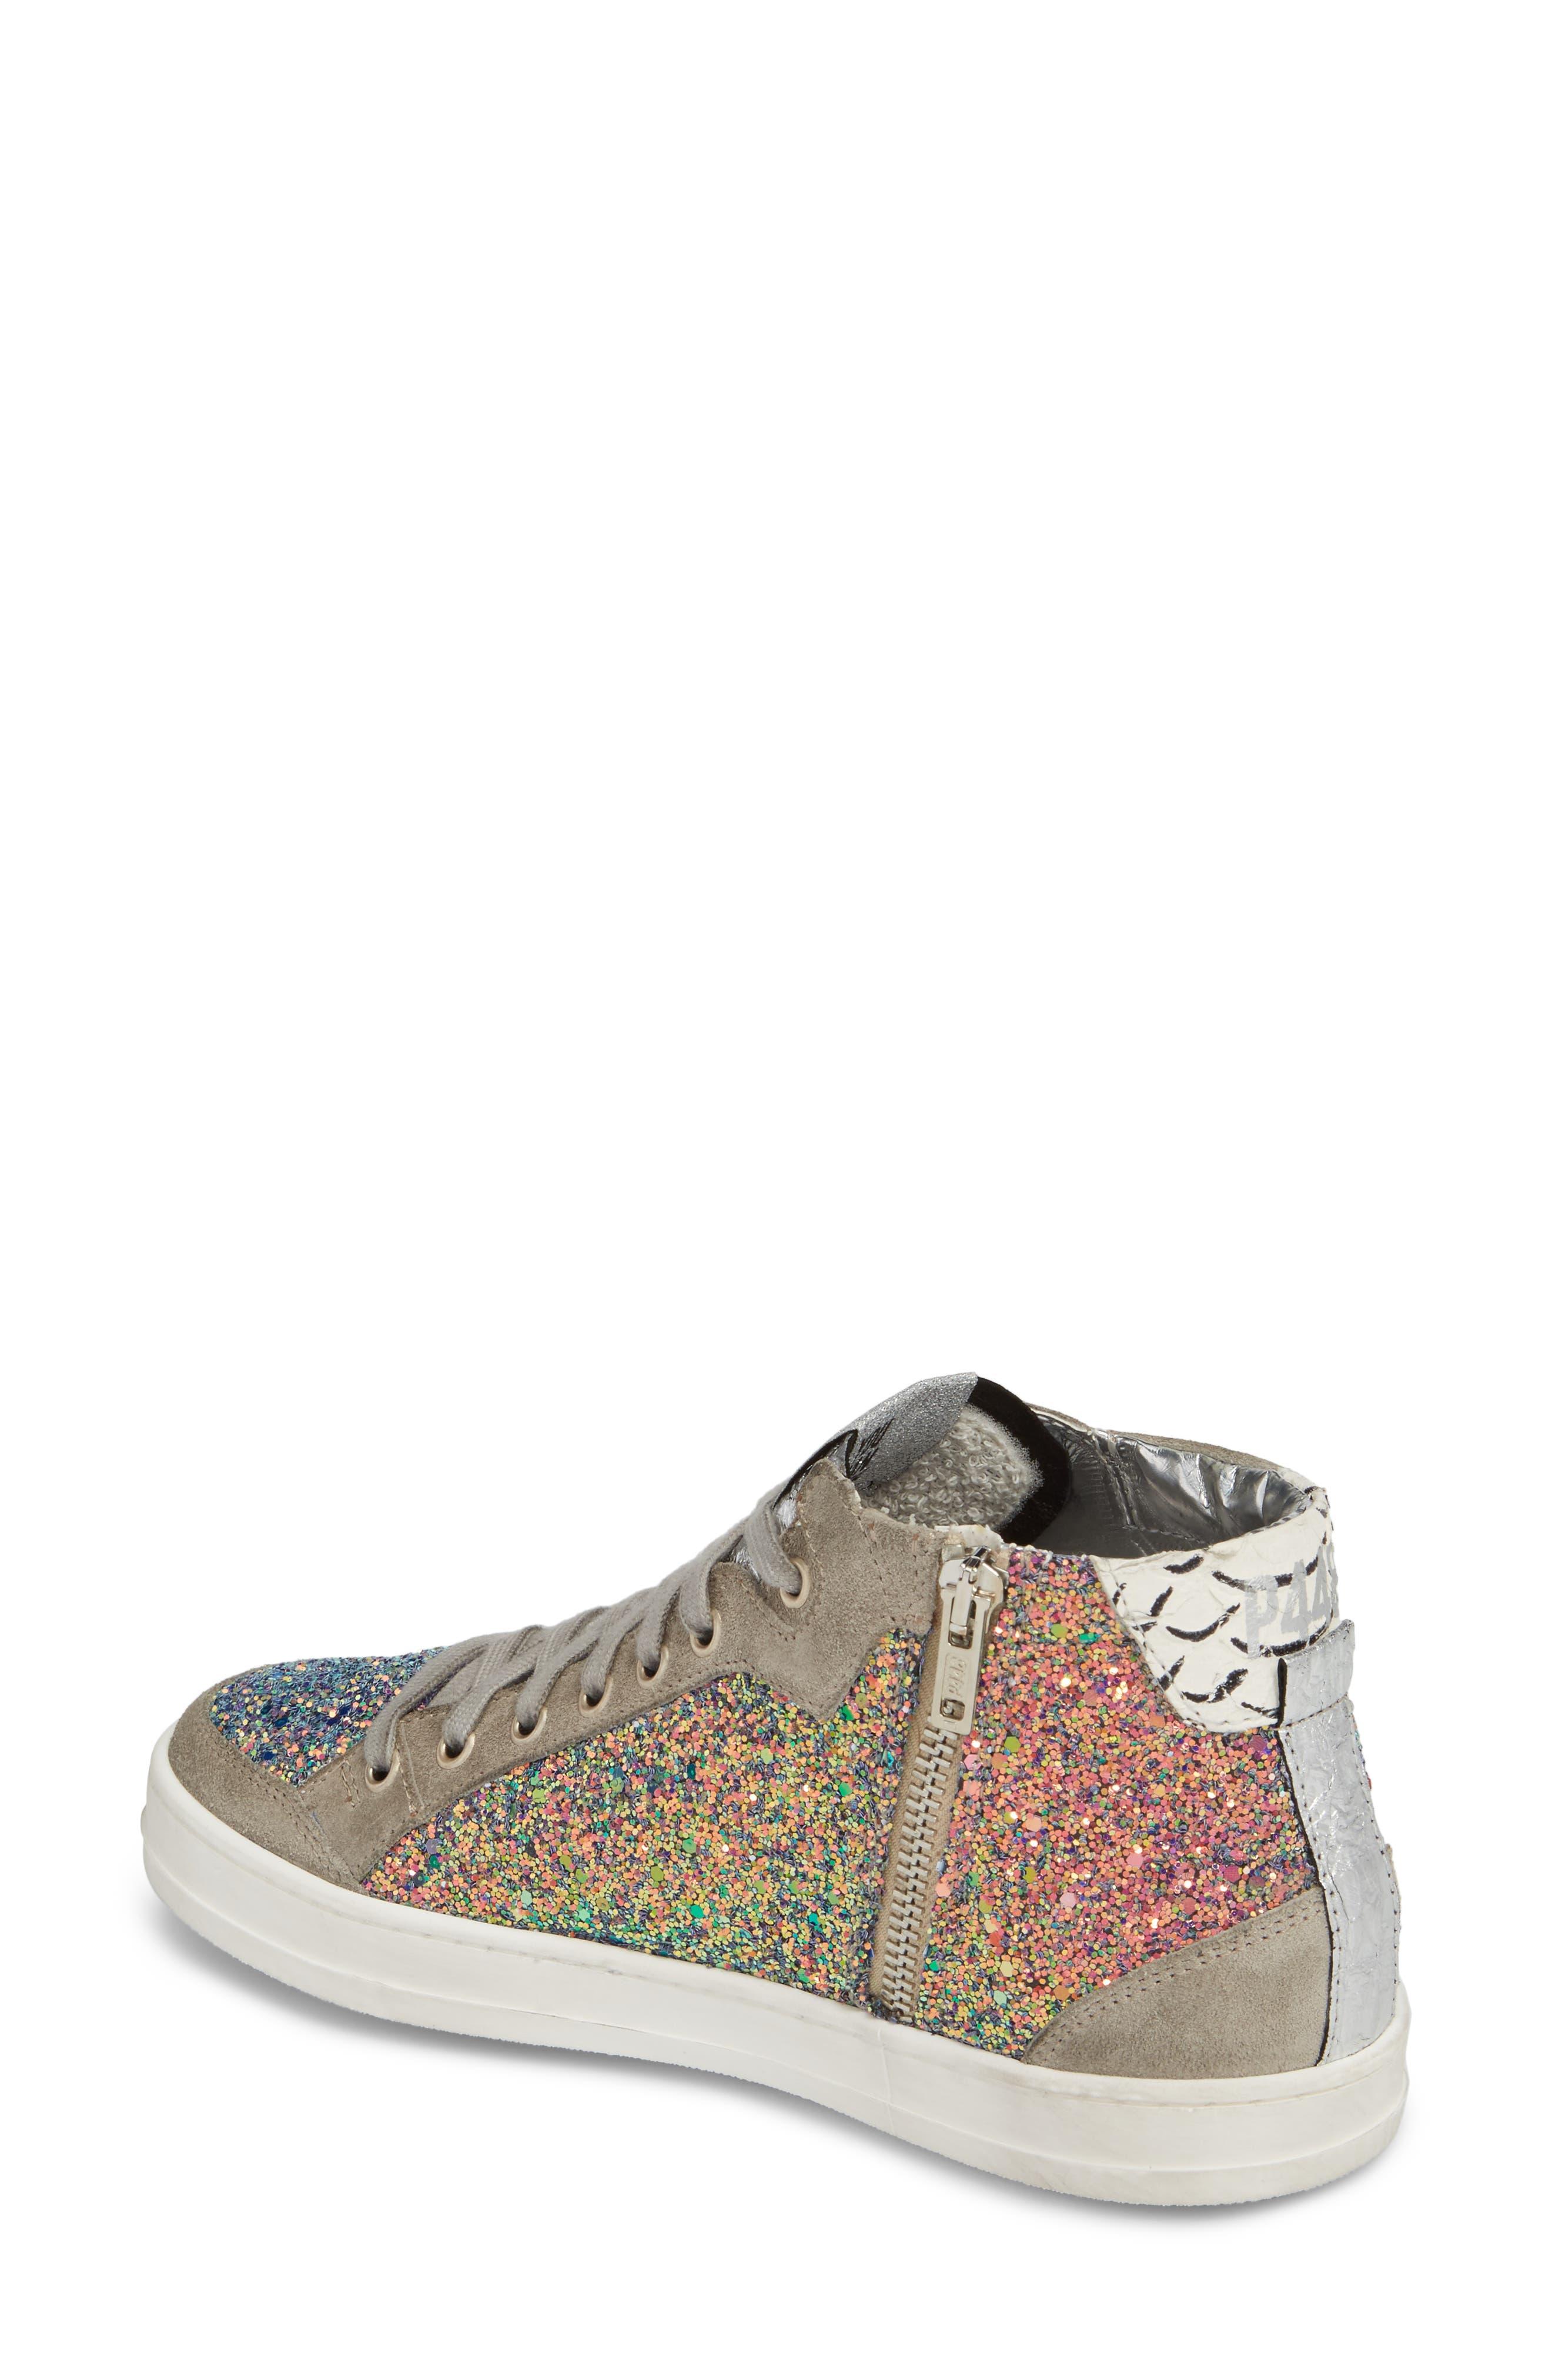 Love Sneaker,                             Alternate thumbnail 2, color,                             Multicolor